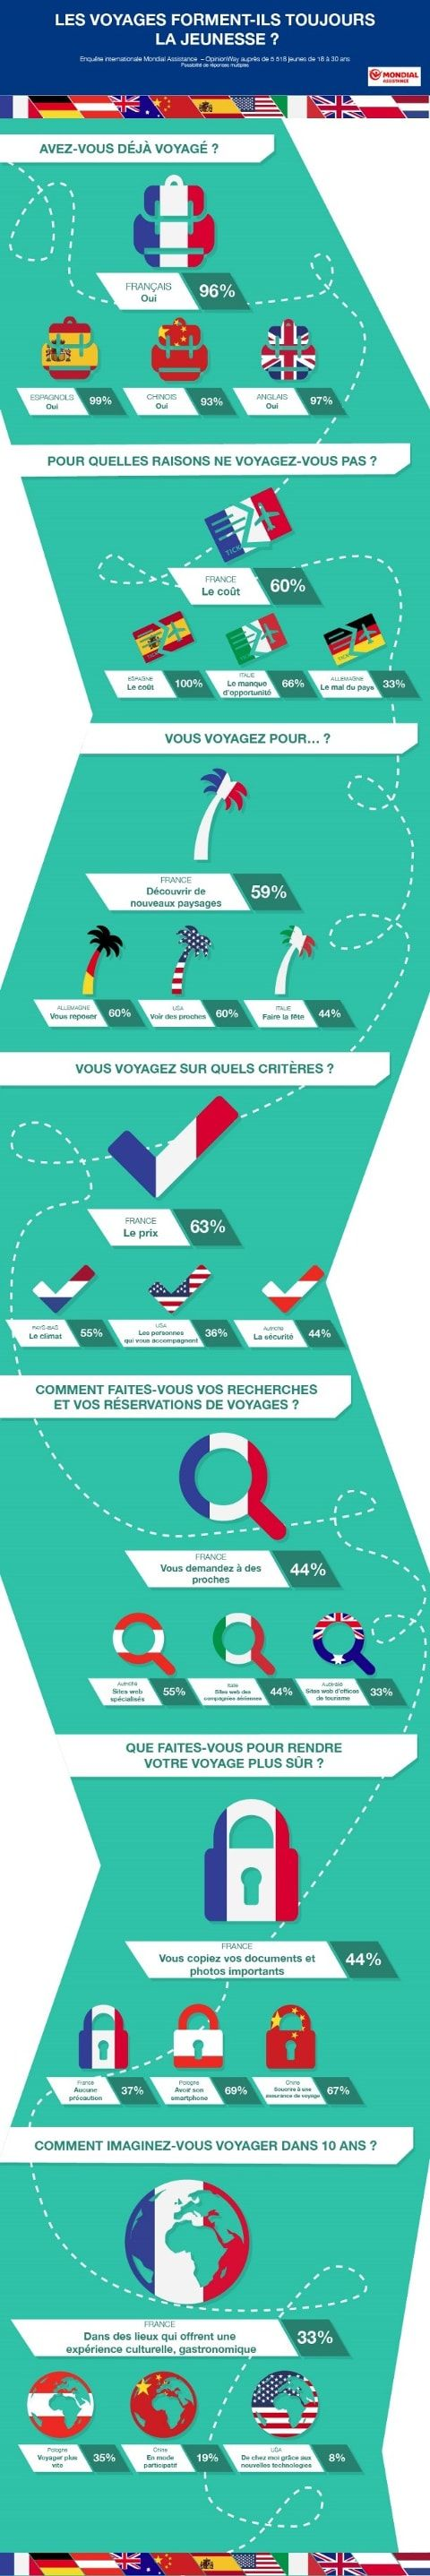 infographie-tourisme-jeunes